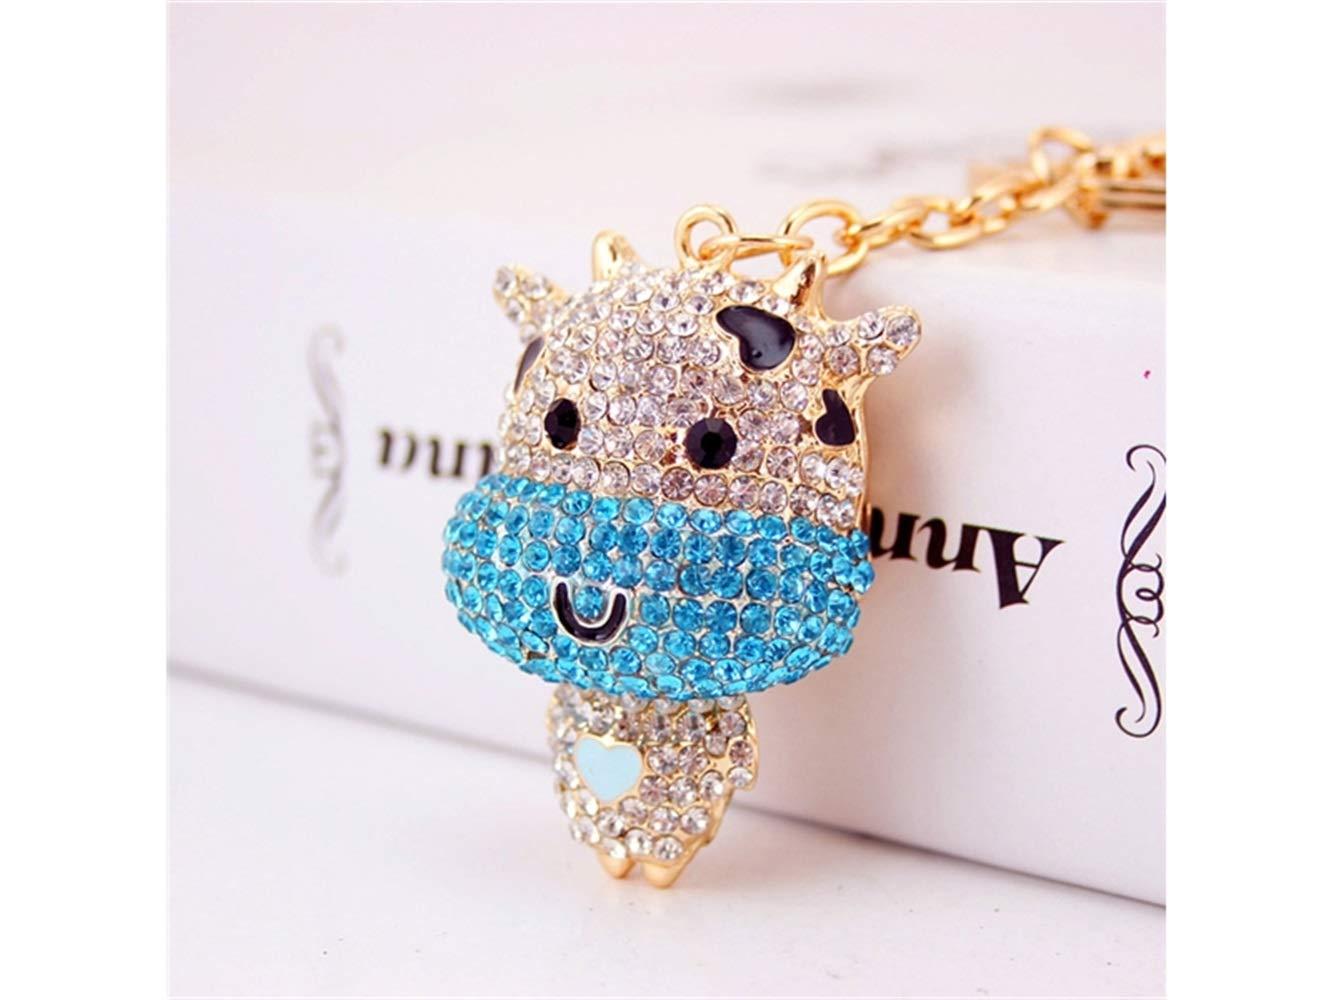 Car Keychain, Diamond Chinese Zodiac Cattle Keychain Animal Shape Key Trinket Car Bag Key Holder Decorations(Blue) for Gift